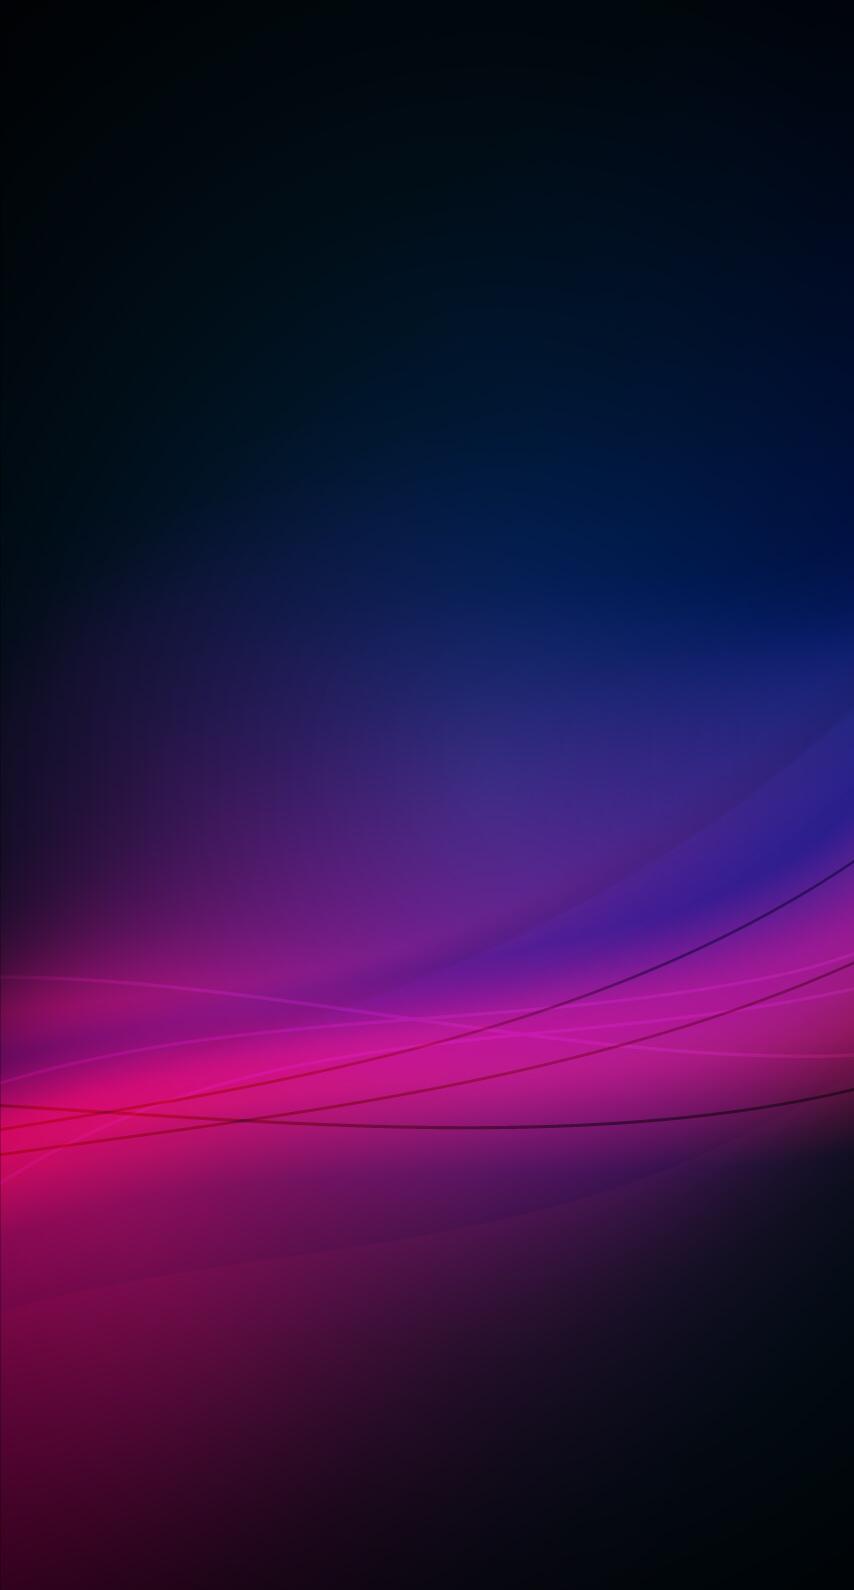 Iphone黒と紫 エレガントなiphoneの壁紙 854x1590 Wallpapertip